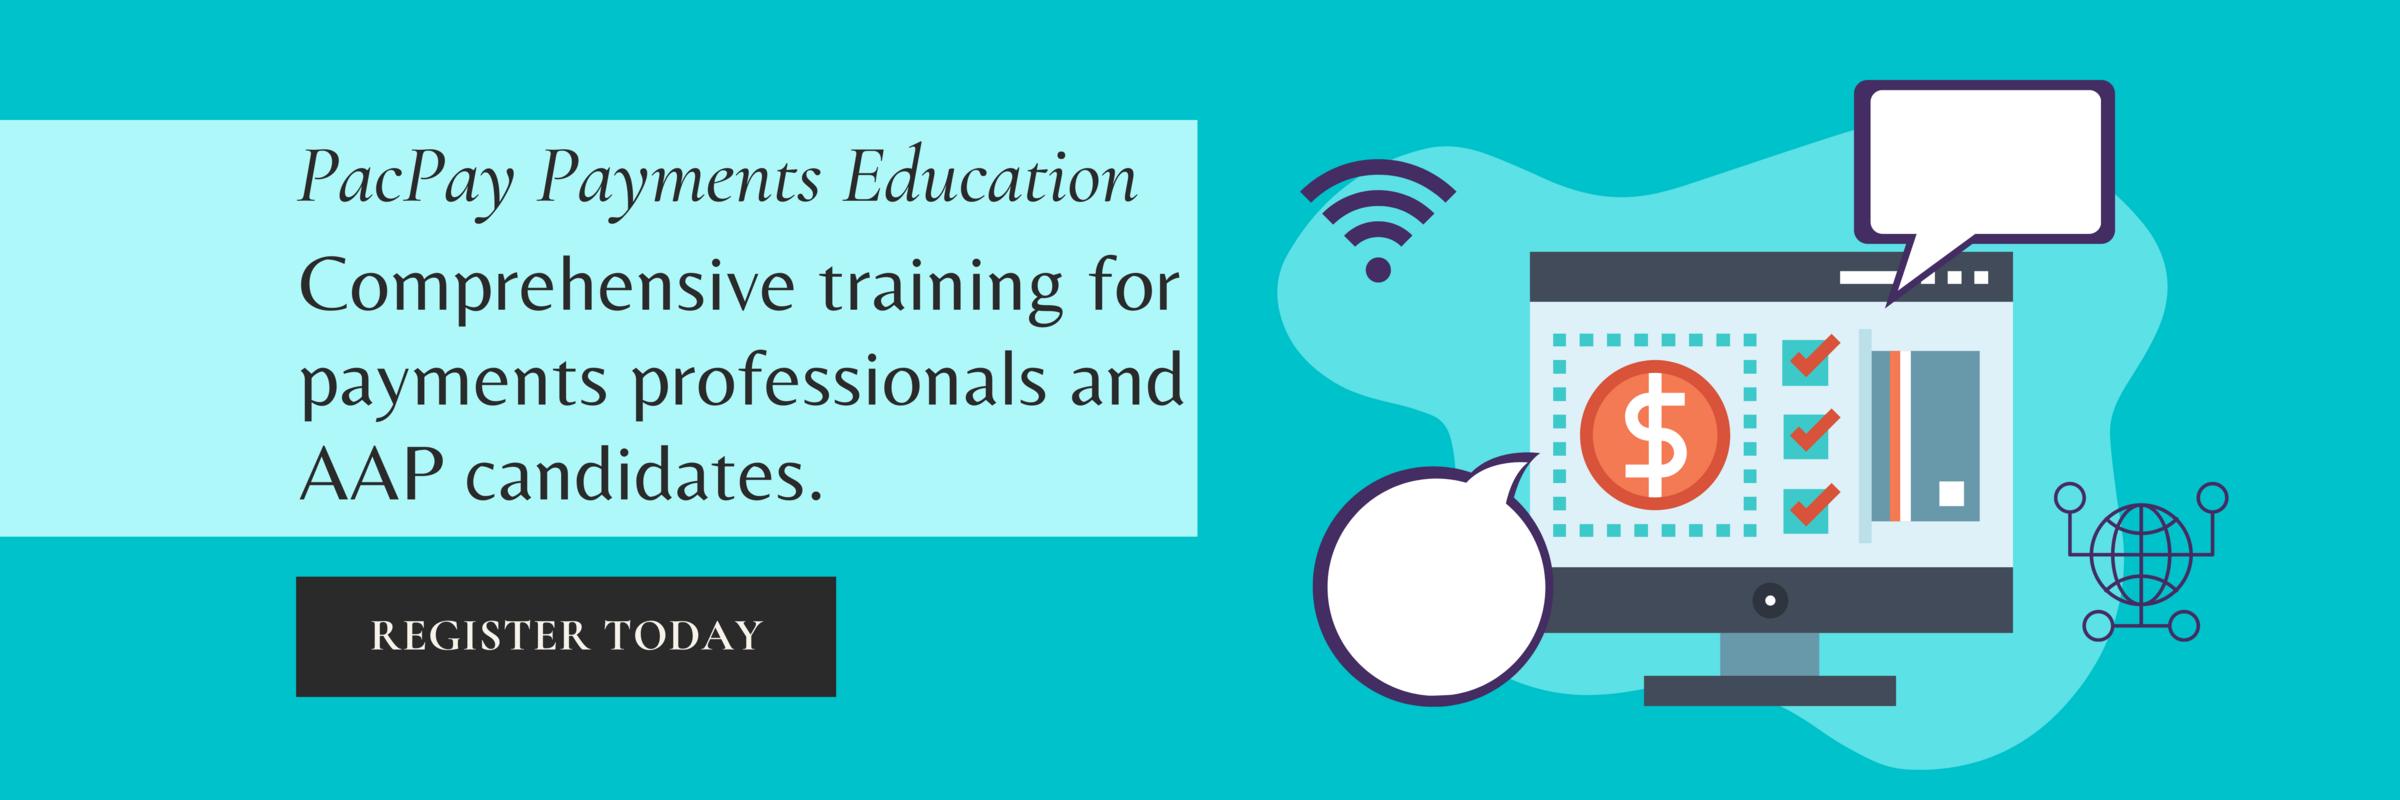 PacPay Virtual Education